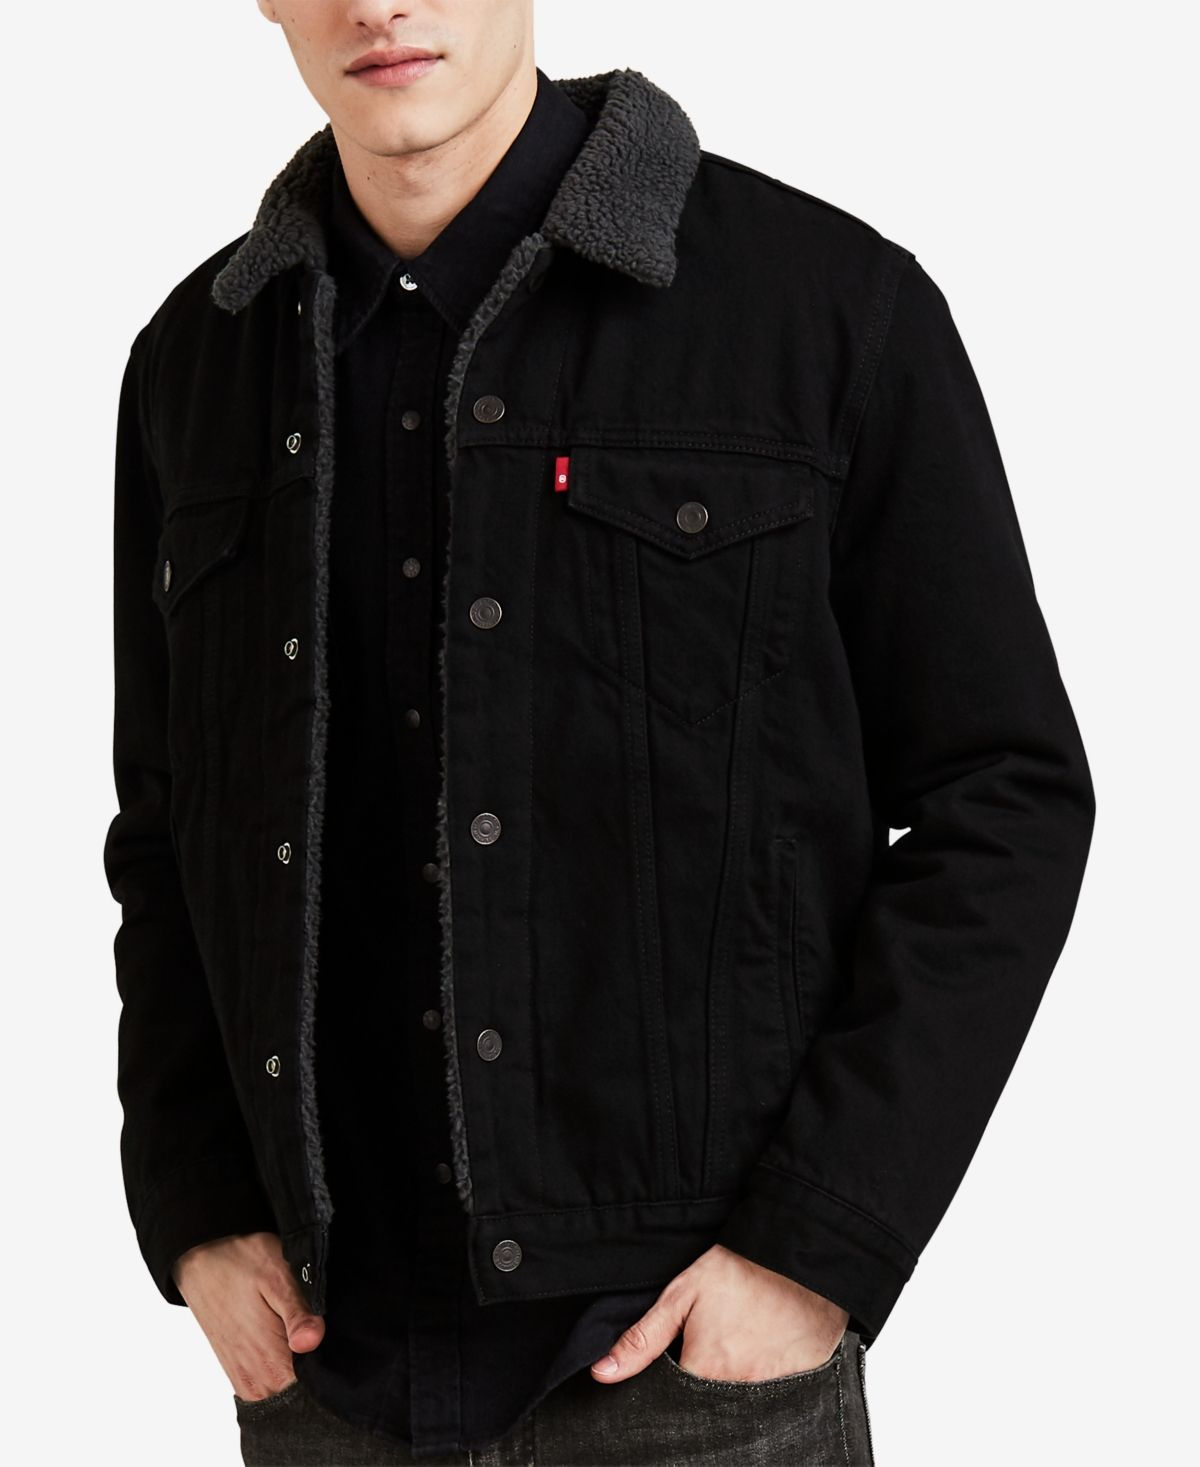 Levi S Men S Sherpa Denim Trucker Jacket Reviews Coats Jackets Men Macy S In 2020 Black Denim Jacket Men Jackets Men Fashion Trucker Jacket Men